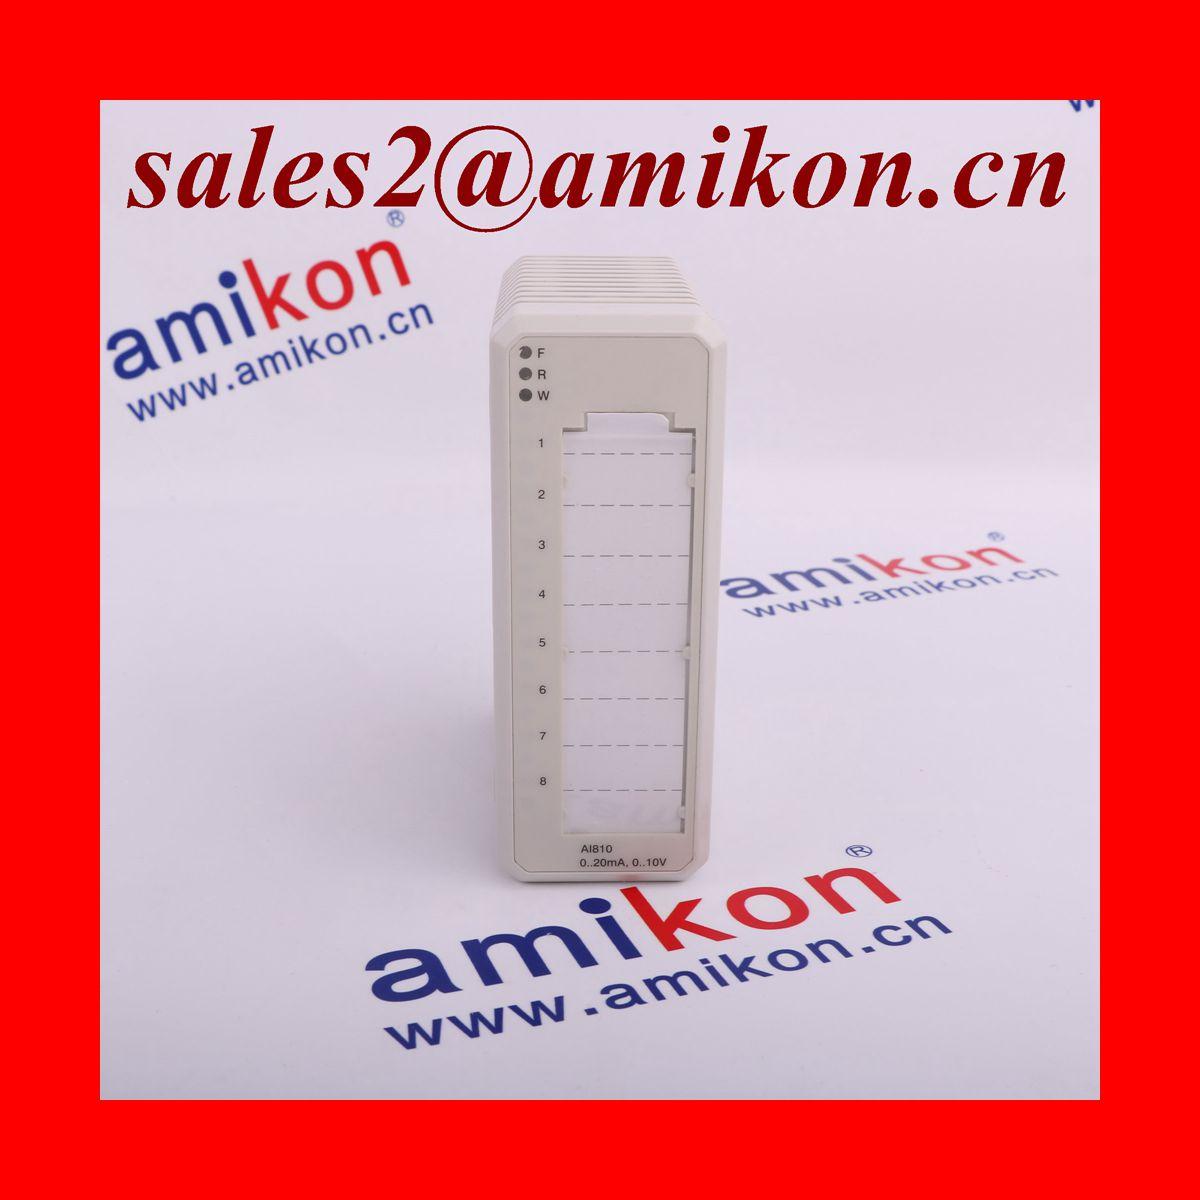 ABB SD812V1 3BSC610045R2 PLC DCS AUTOMATION SPARE PARTS